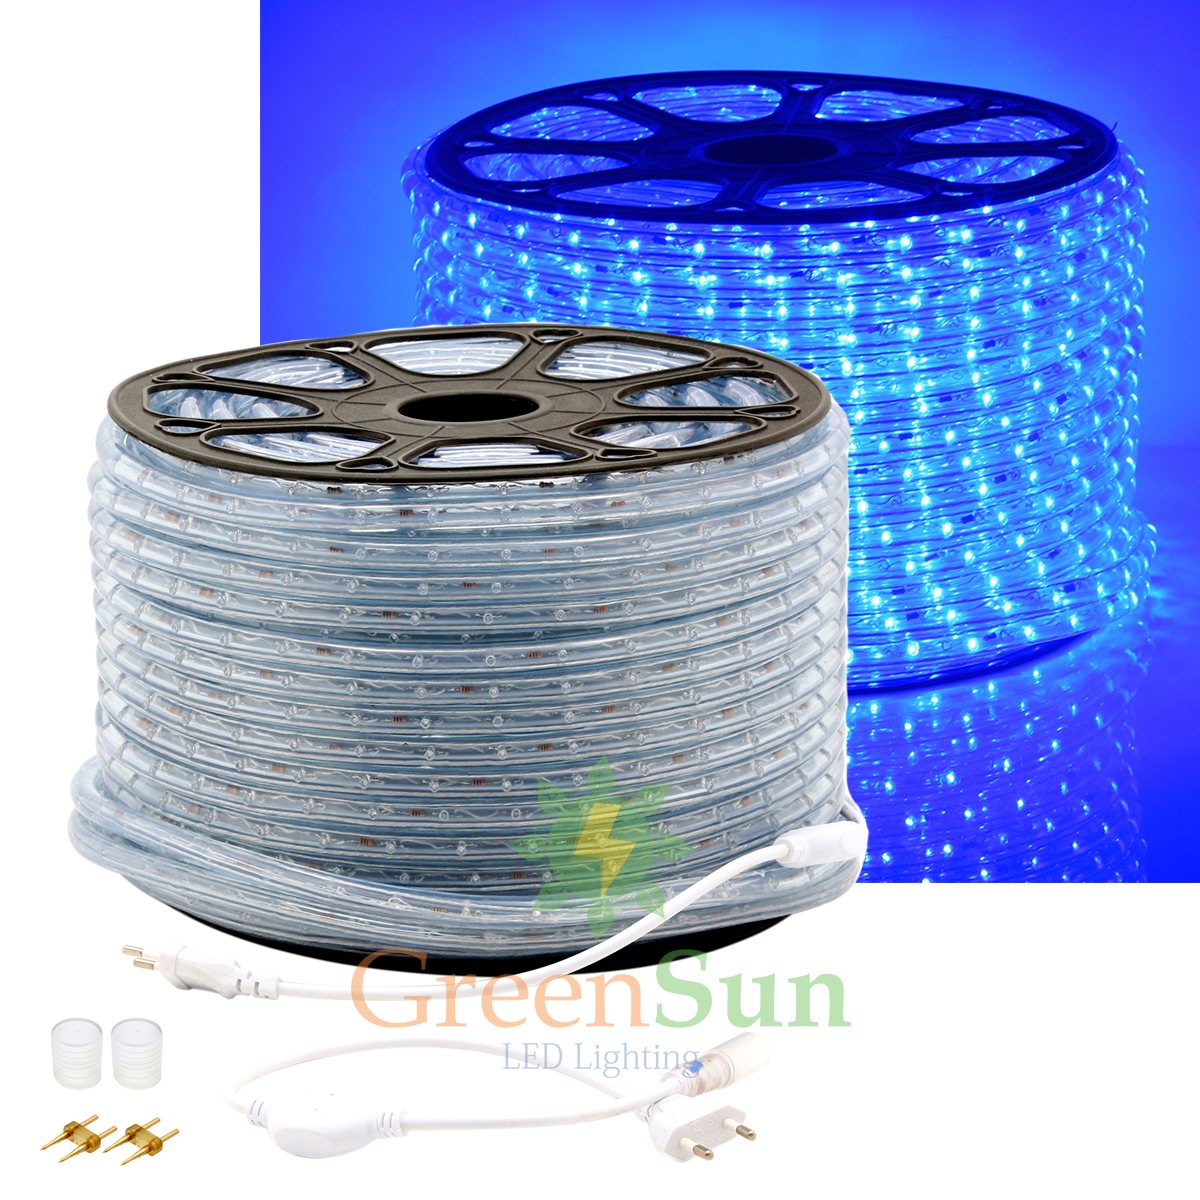 ON Sale LED Strips 5630 Waterproof Kitchen Tiras Flexible Tape Light ...